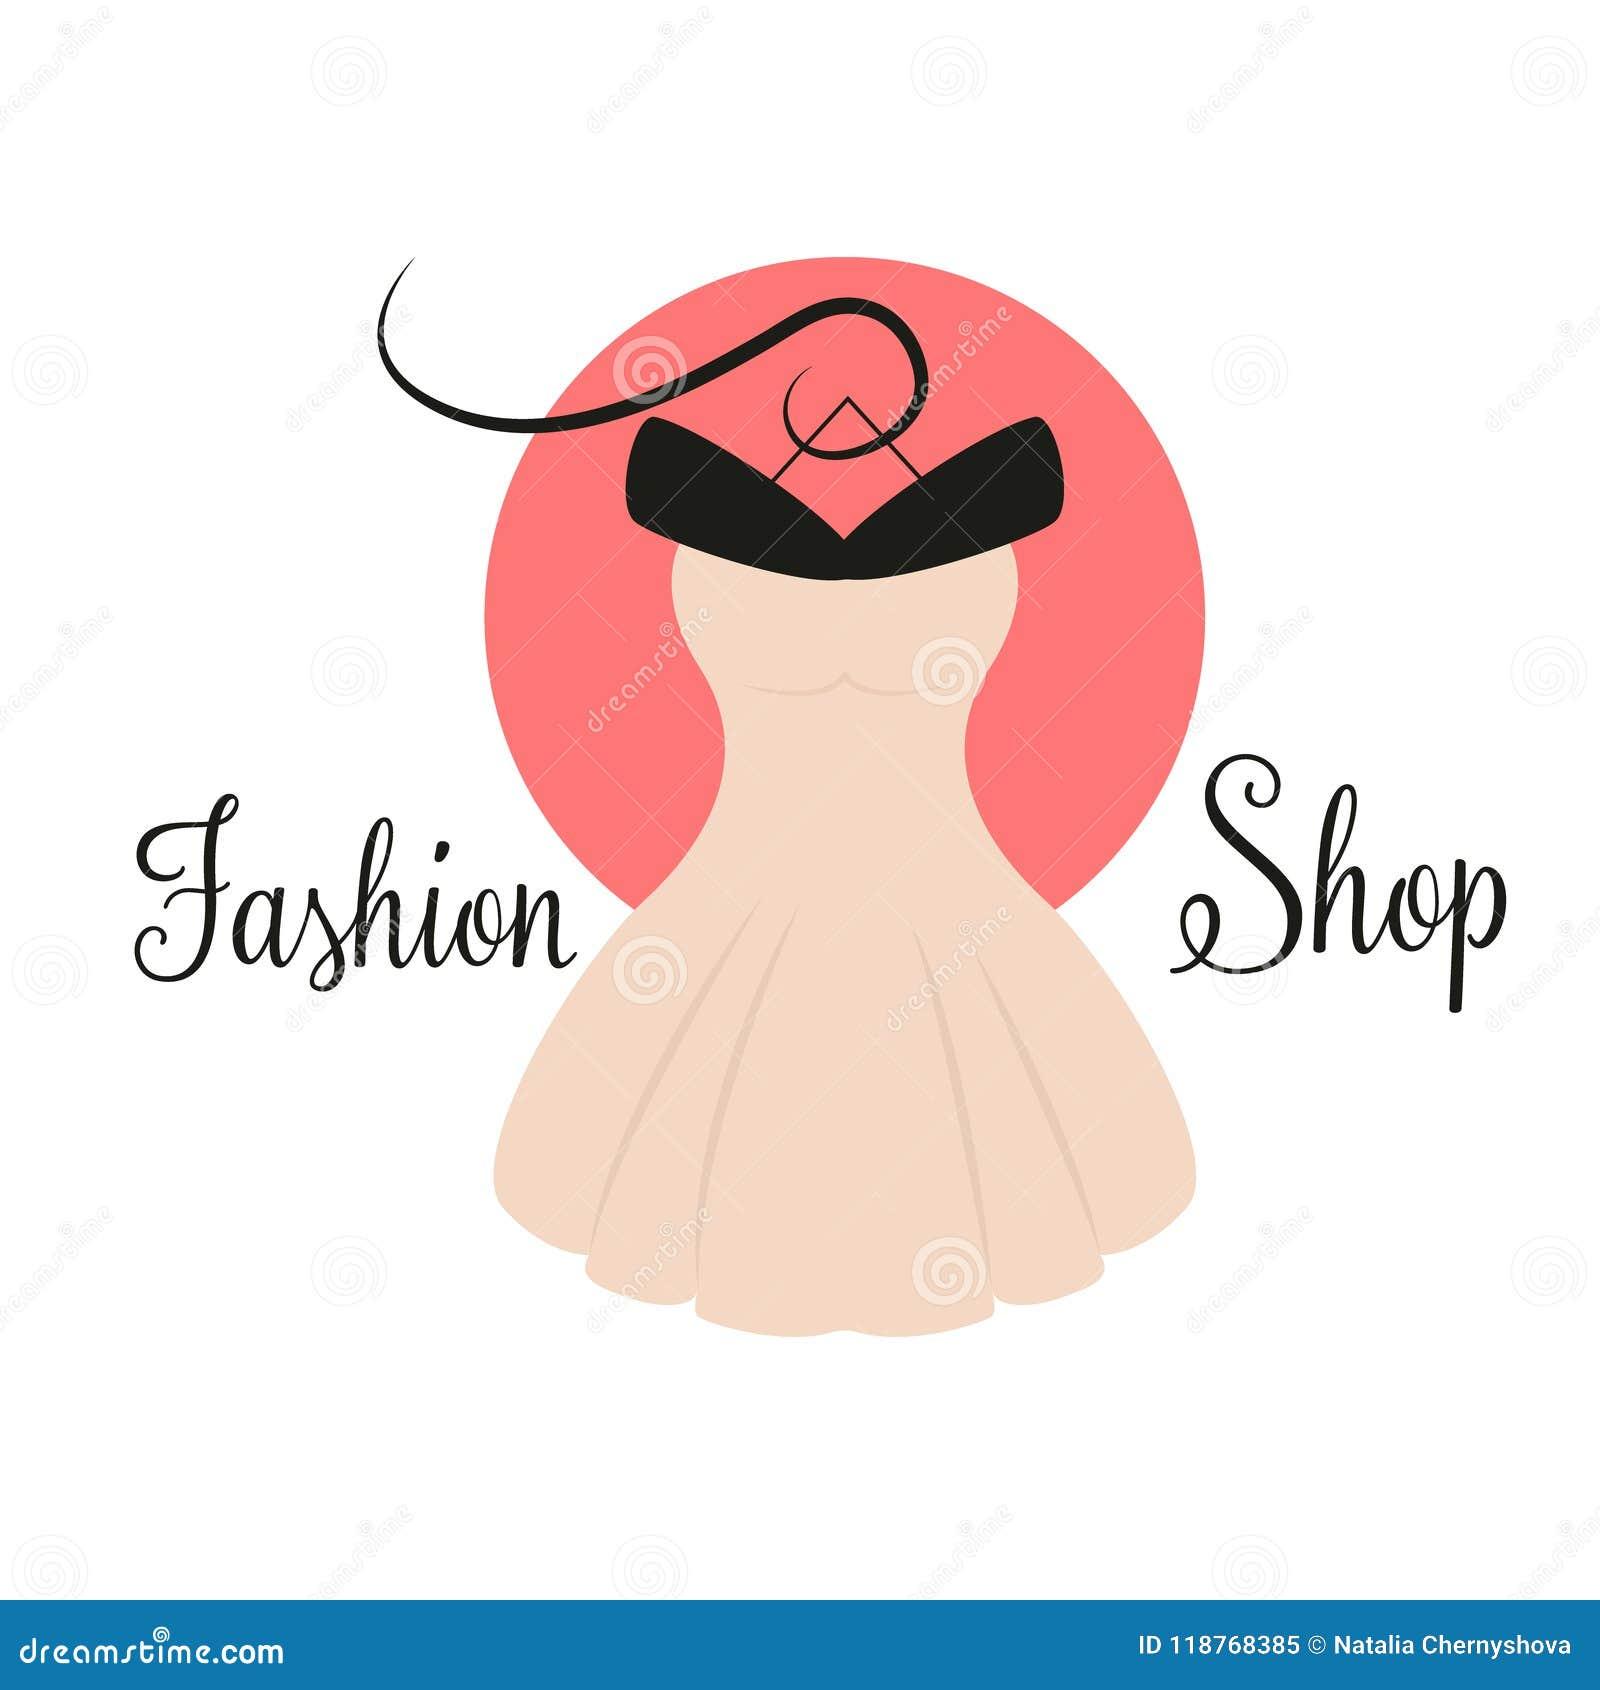 Women fashion logo design template dress emblem stock vector download women fashion logo design template dress emblem stock vector illustration of logotype maxwellsz